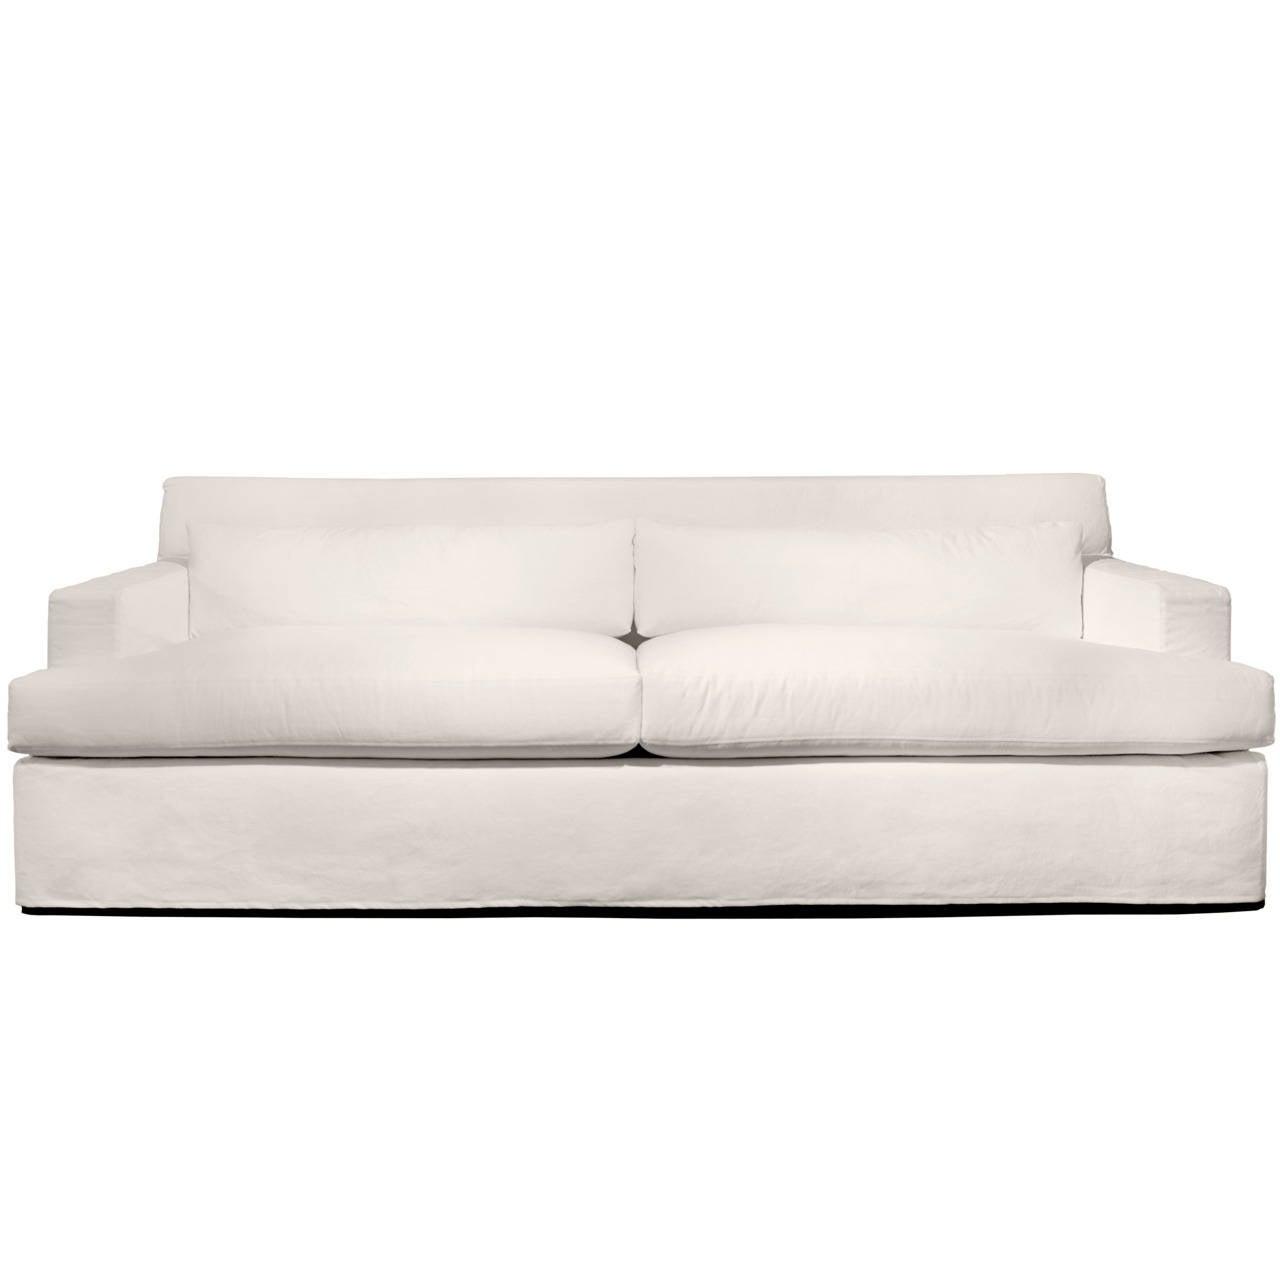 Michael Dawkins sofa, new